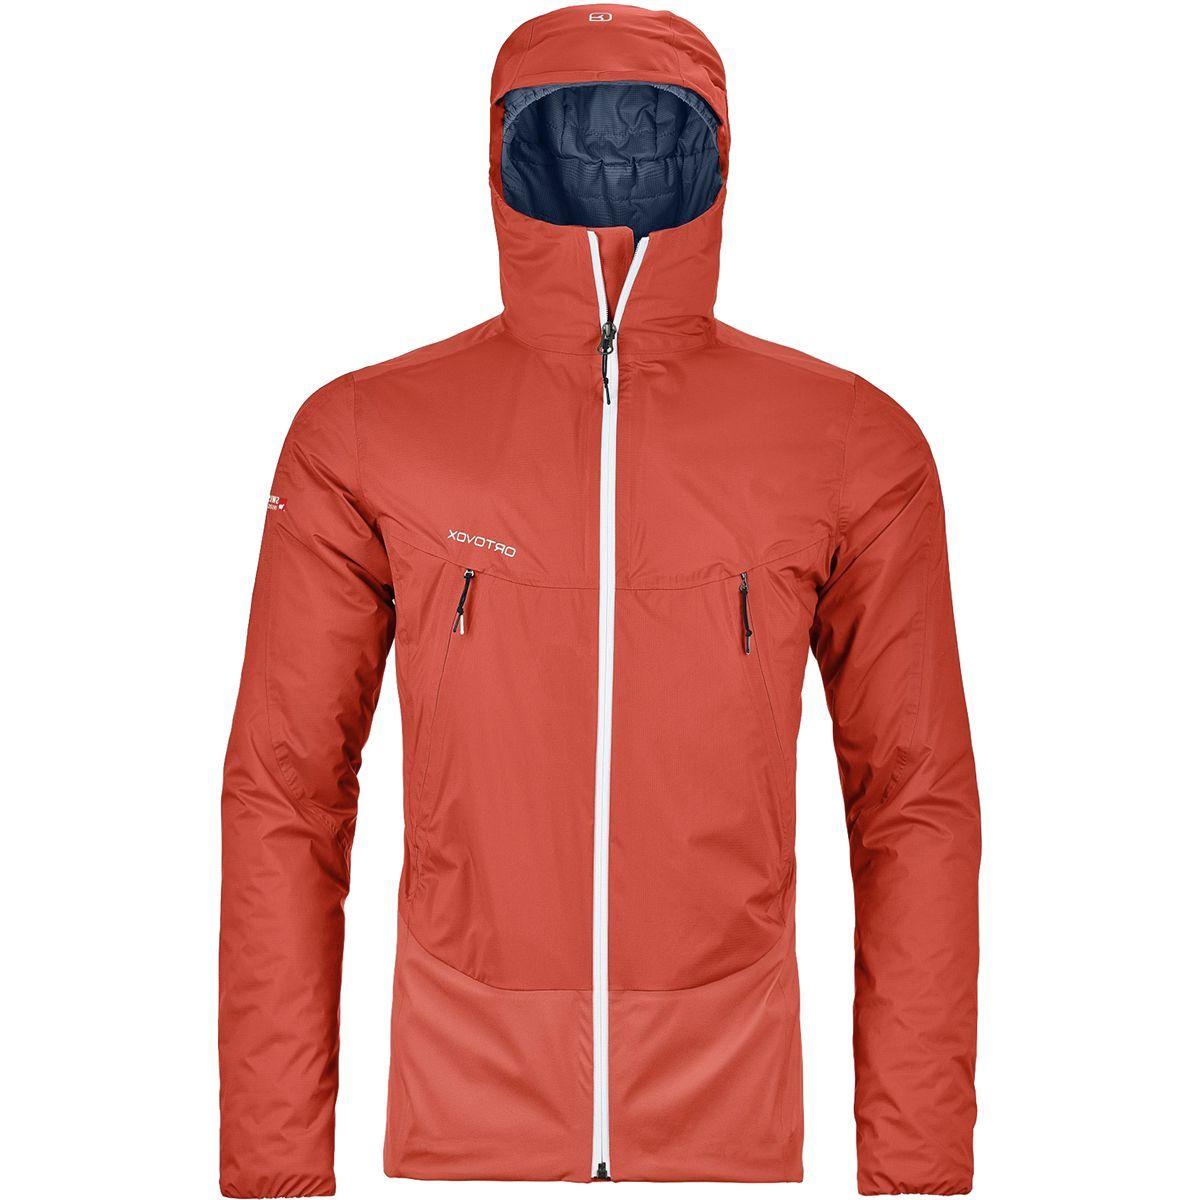 Ortovox Swisswool Leone 2L Jacket - Men's